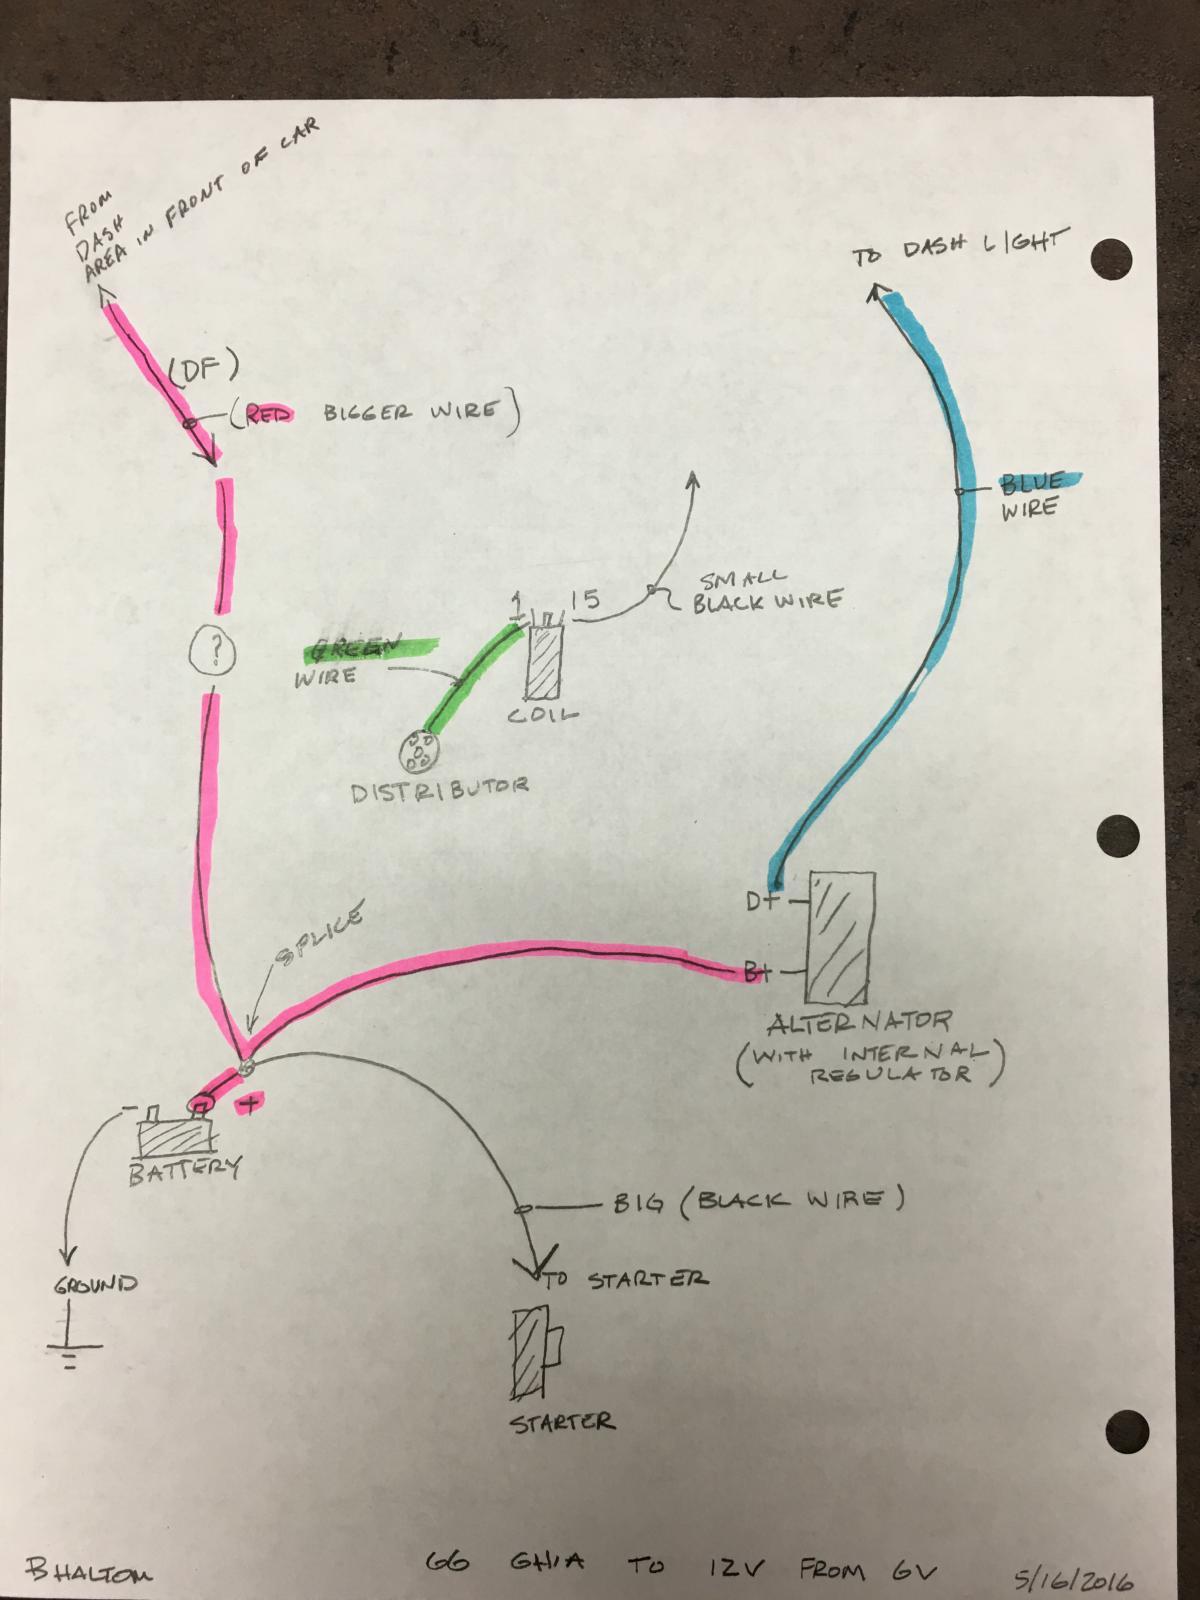 Champion Generator Wiring Diagram Fitfathersme cafe chart